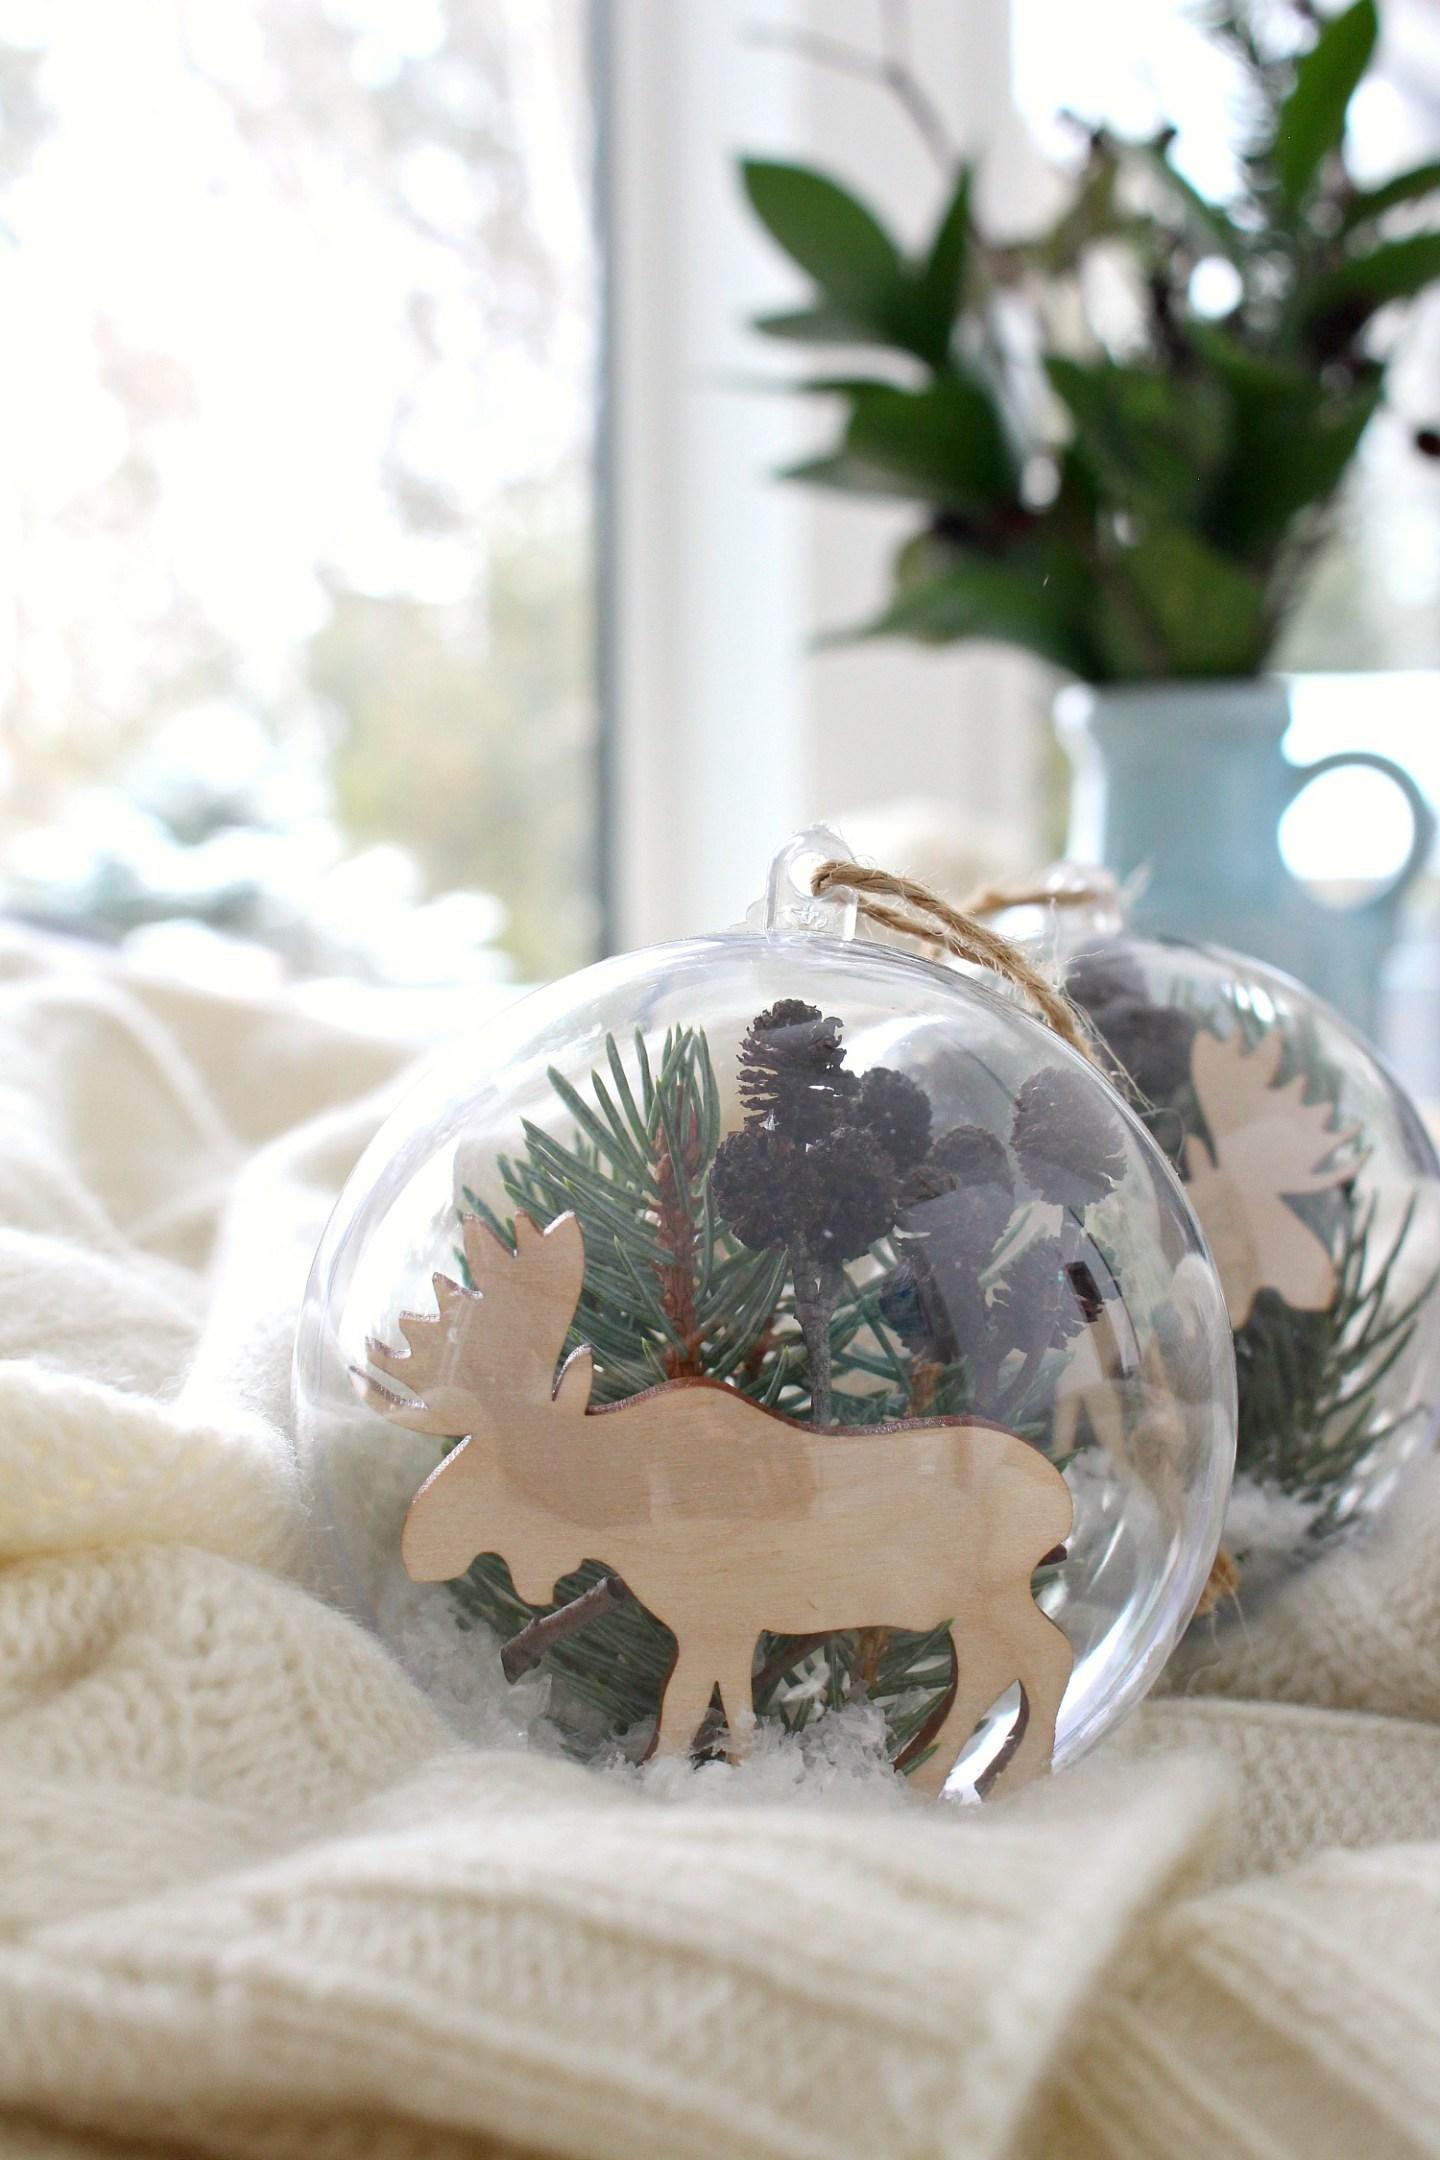 DIY Moose Ornament